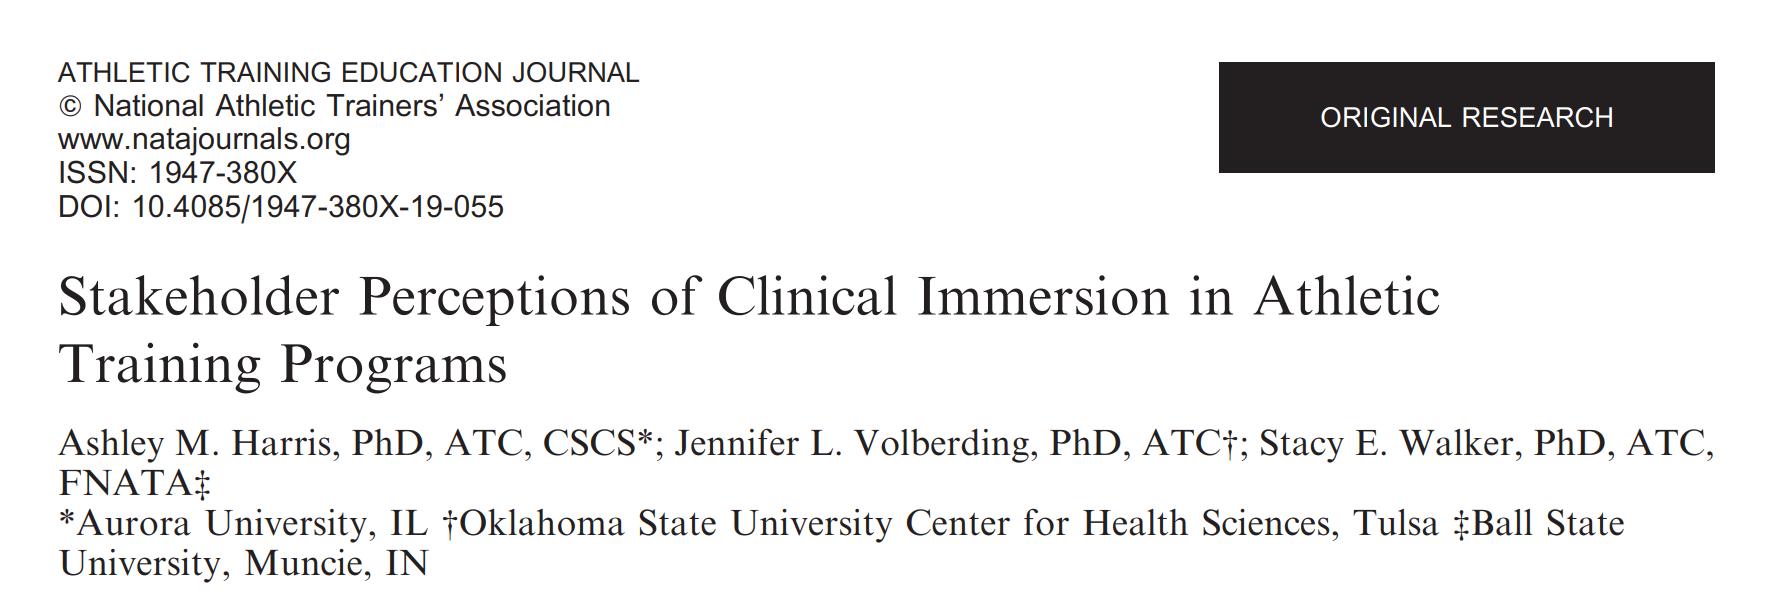 Clinical Immersion (臨床没入)をAT教育に採用するということ。_b0112009_12233684.png